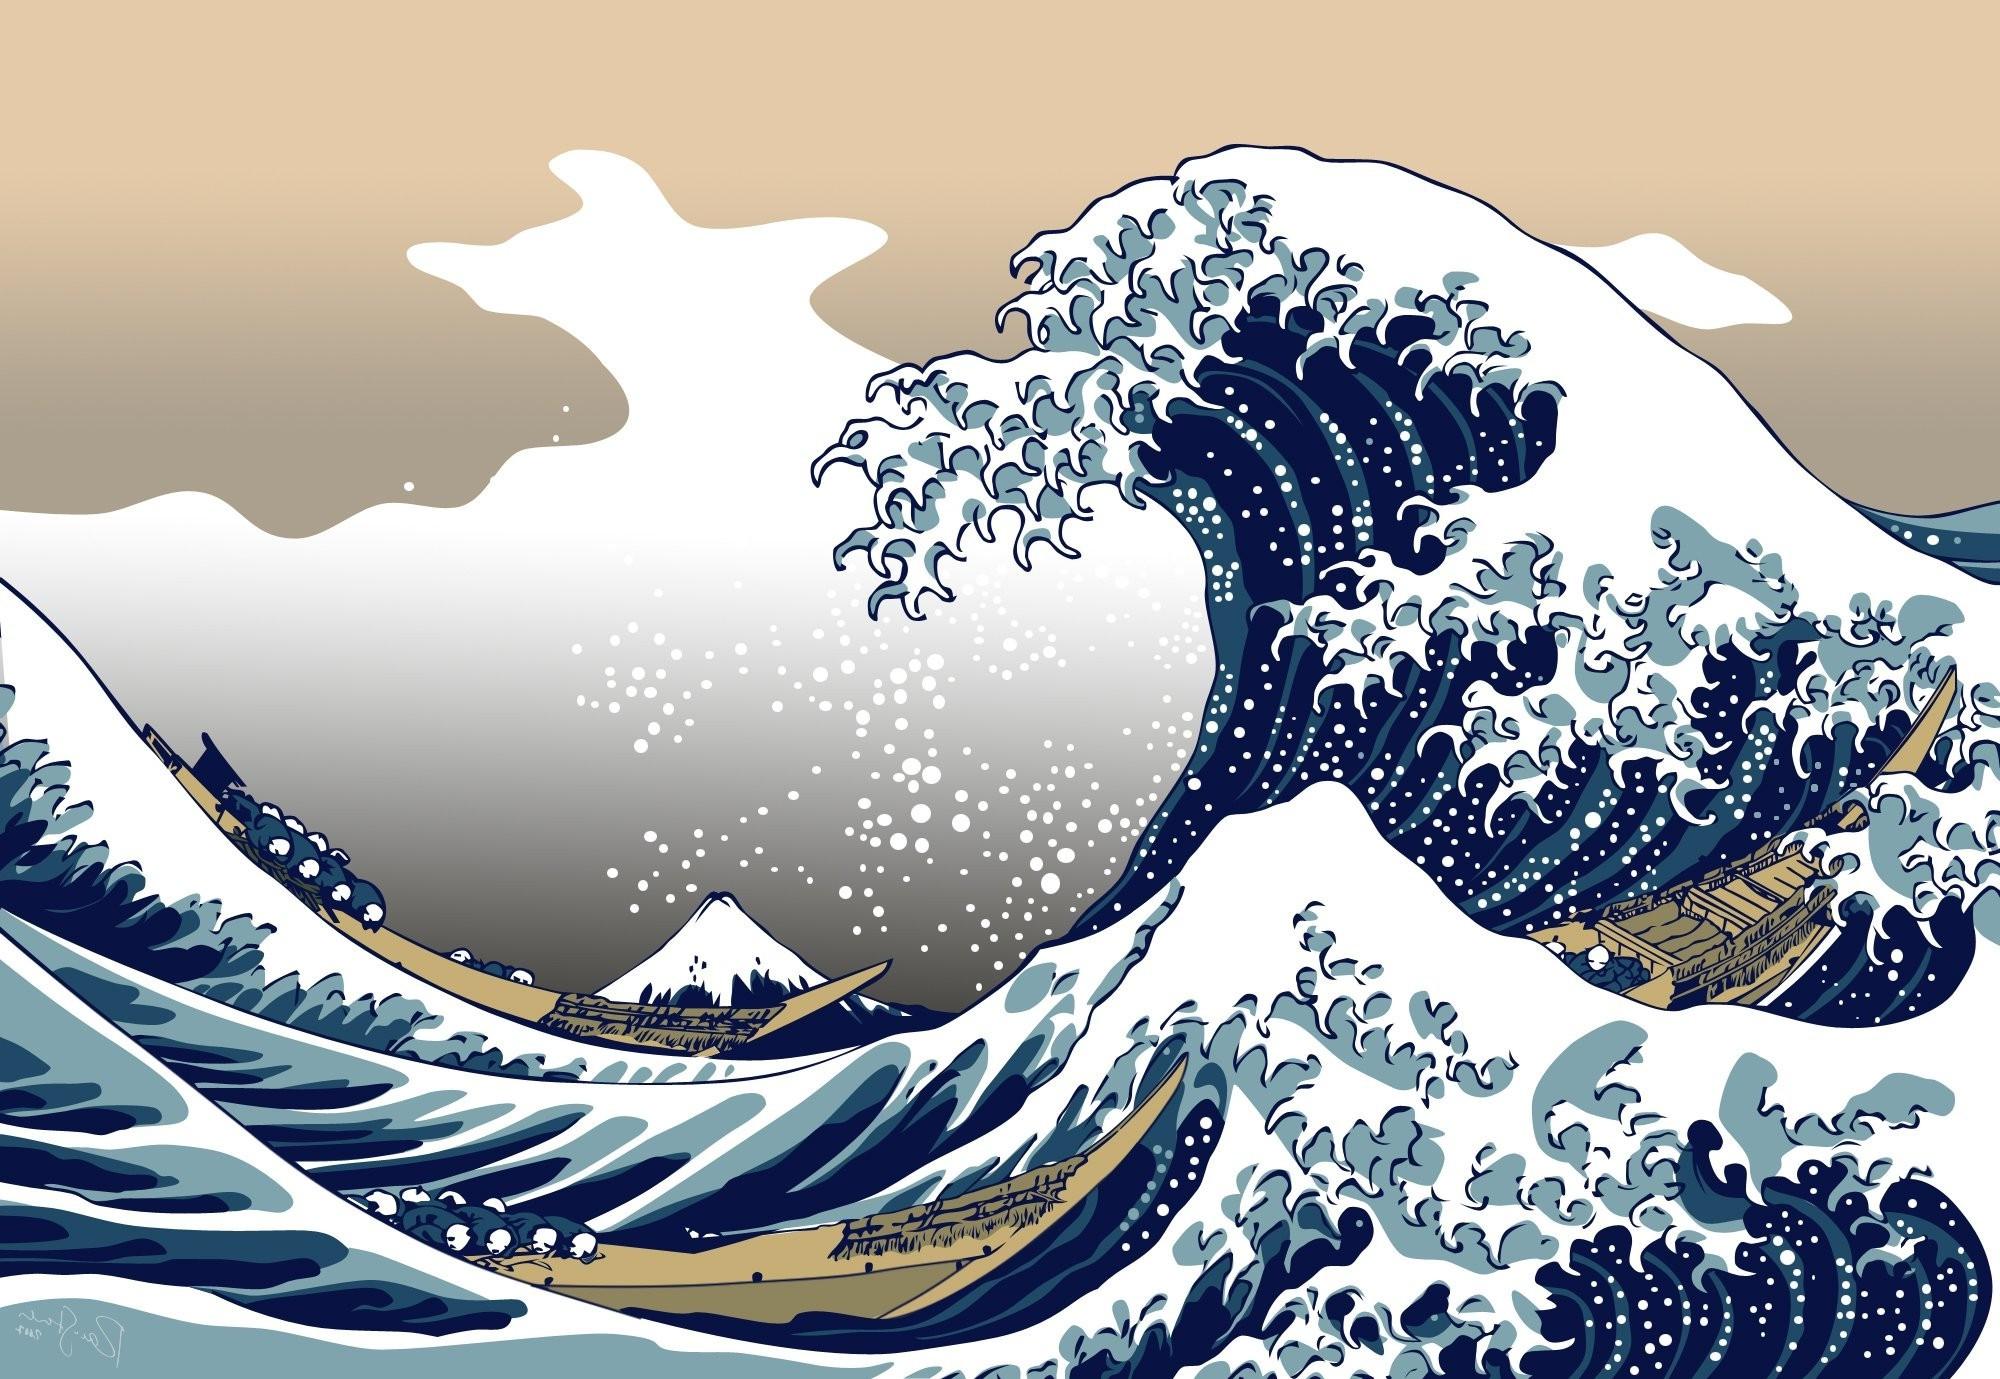 Hintergrundbilder Illustration Natur Blau Karikatur Wind Die